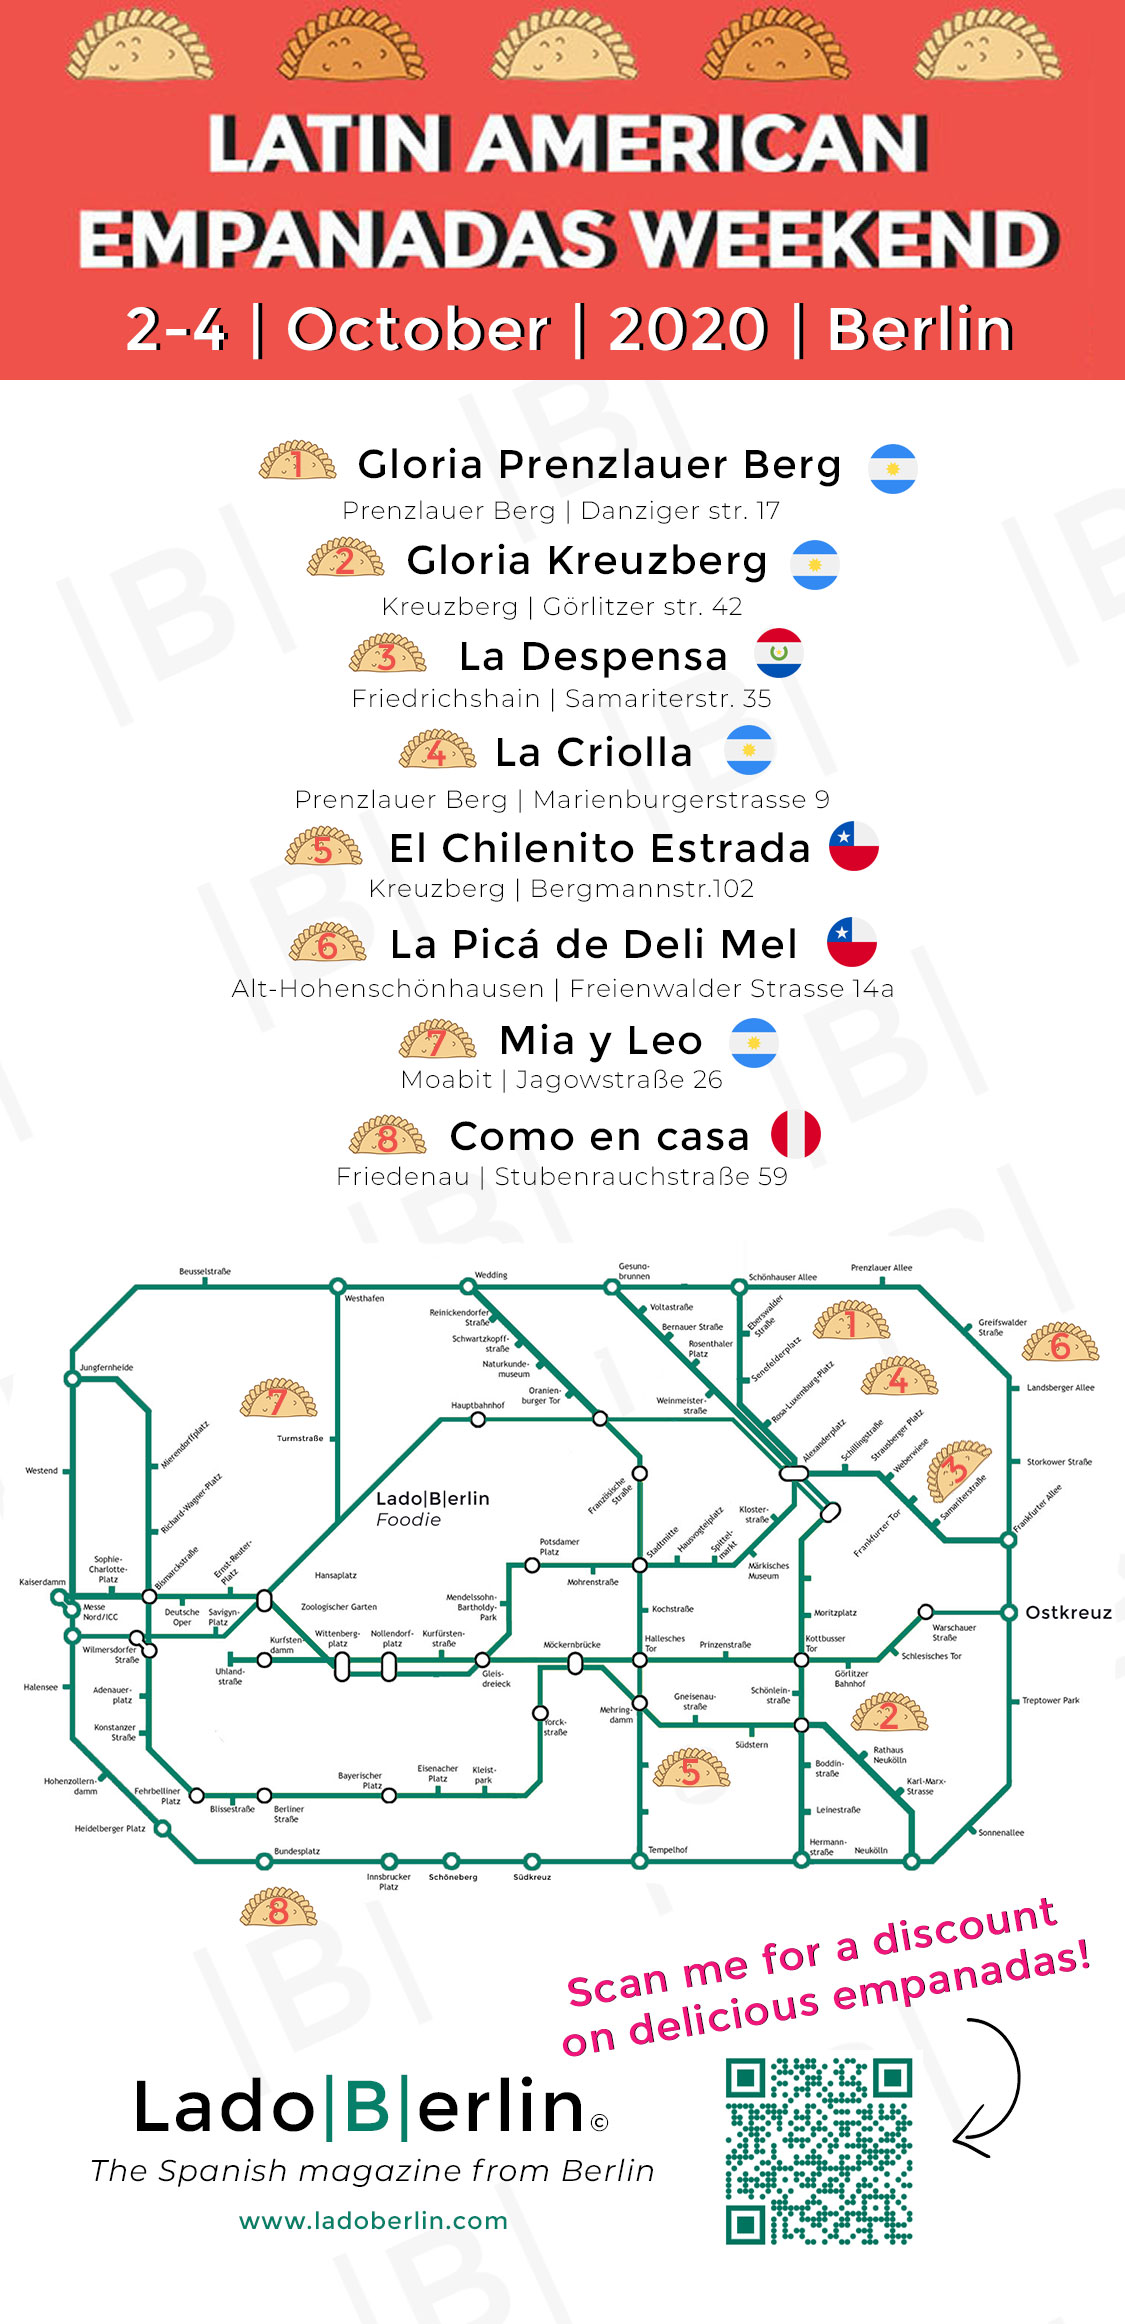 Restaurant Map - 1st Festival of Latin American Empanadas in Berlin 2-4 October 2020 - organized by the Spanish Magazine from Germany Lado|B|erlin.